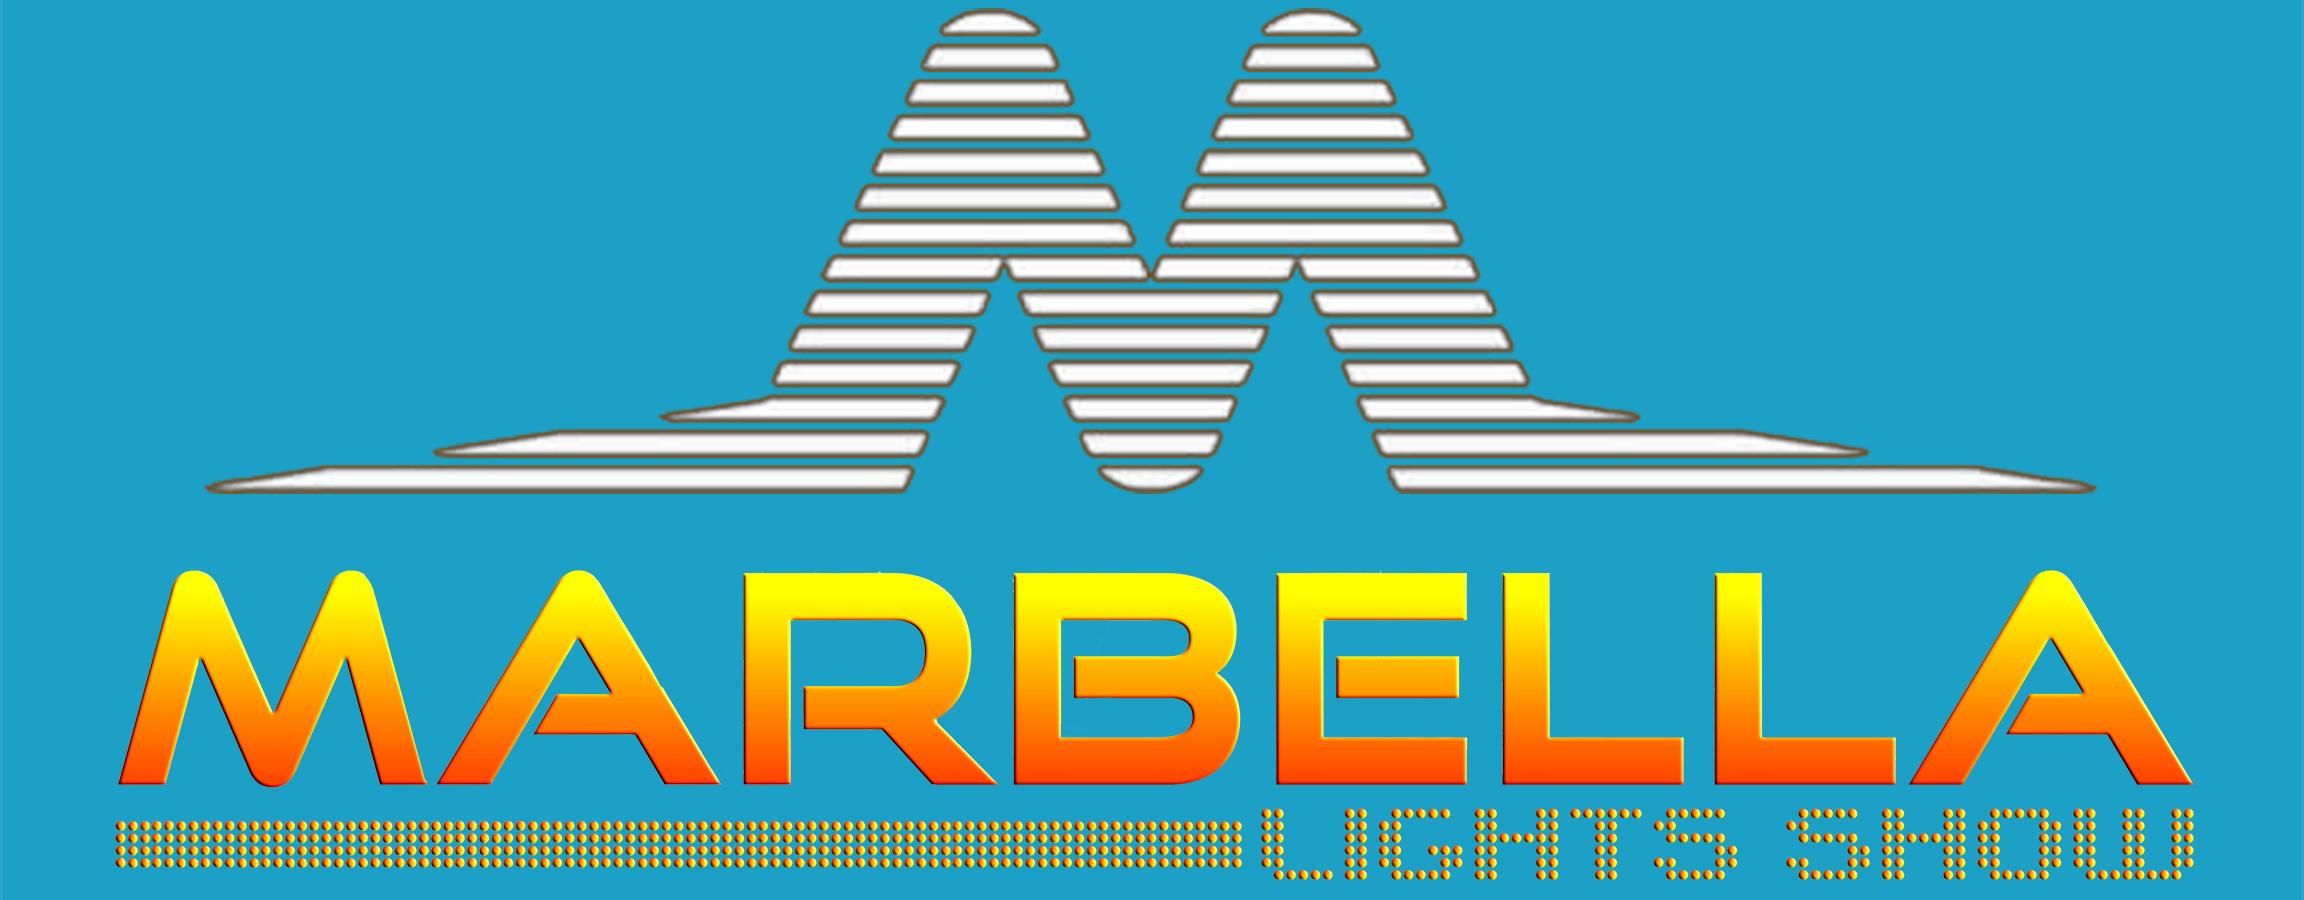 Marbella-fondoAZUL-7